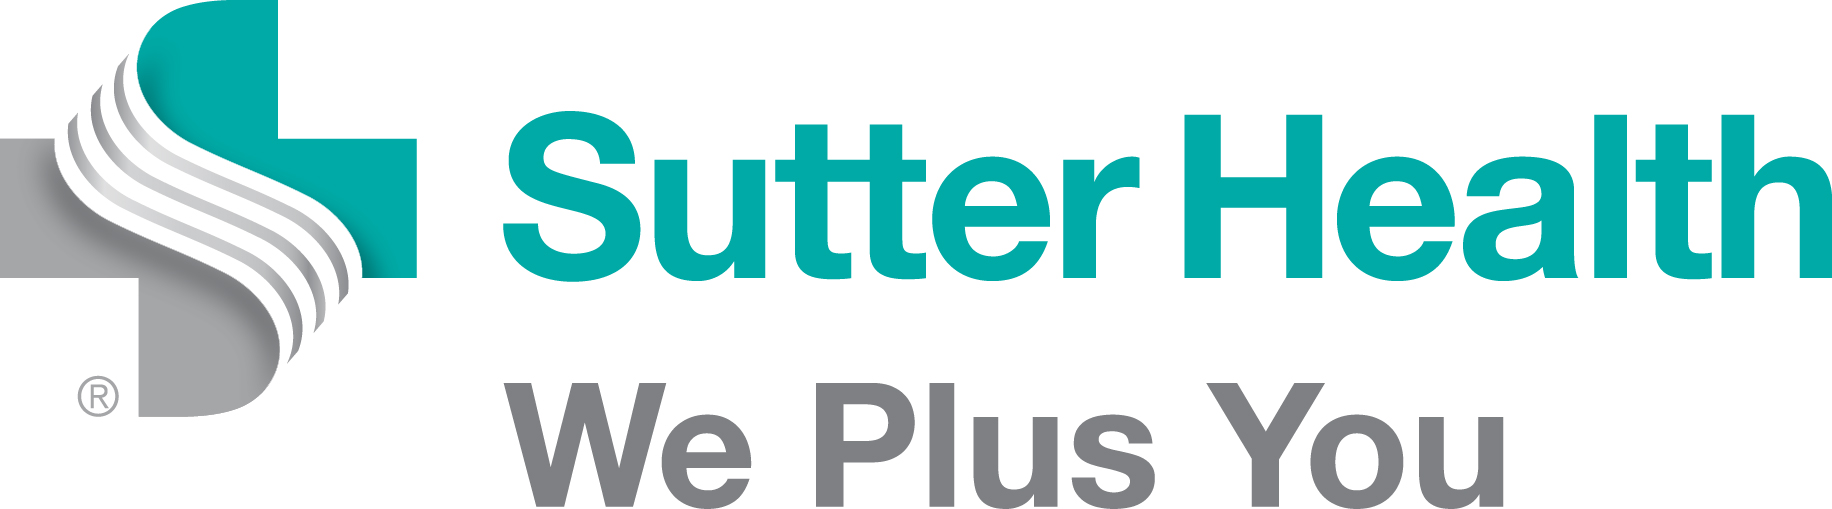 Suuter Health Pathology - Speech Recognition Solution